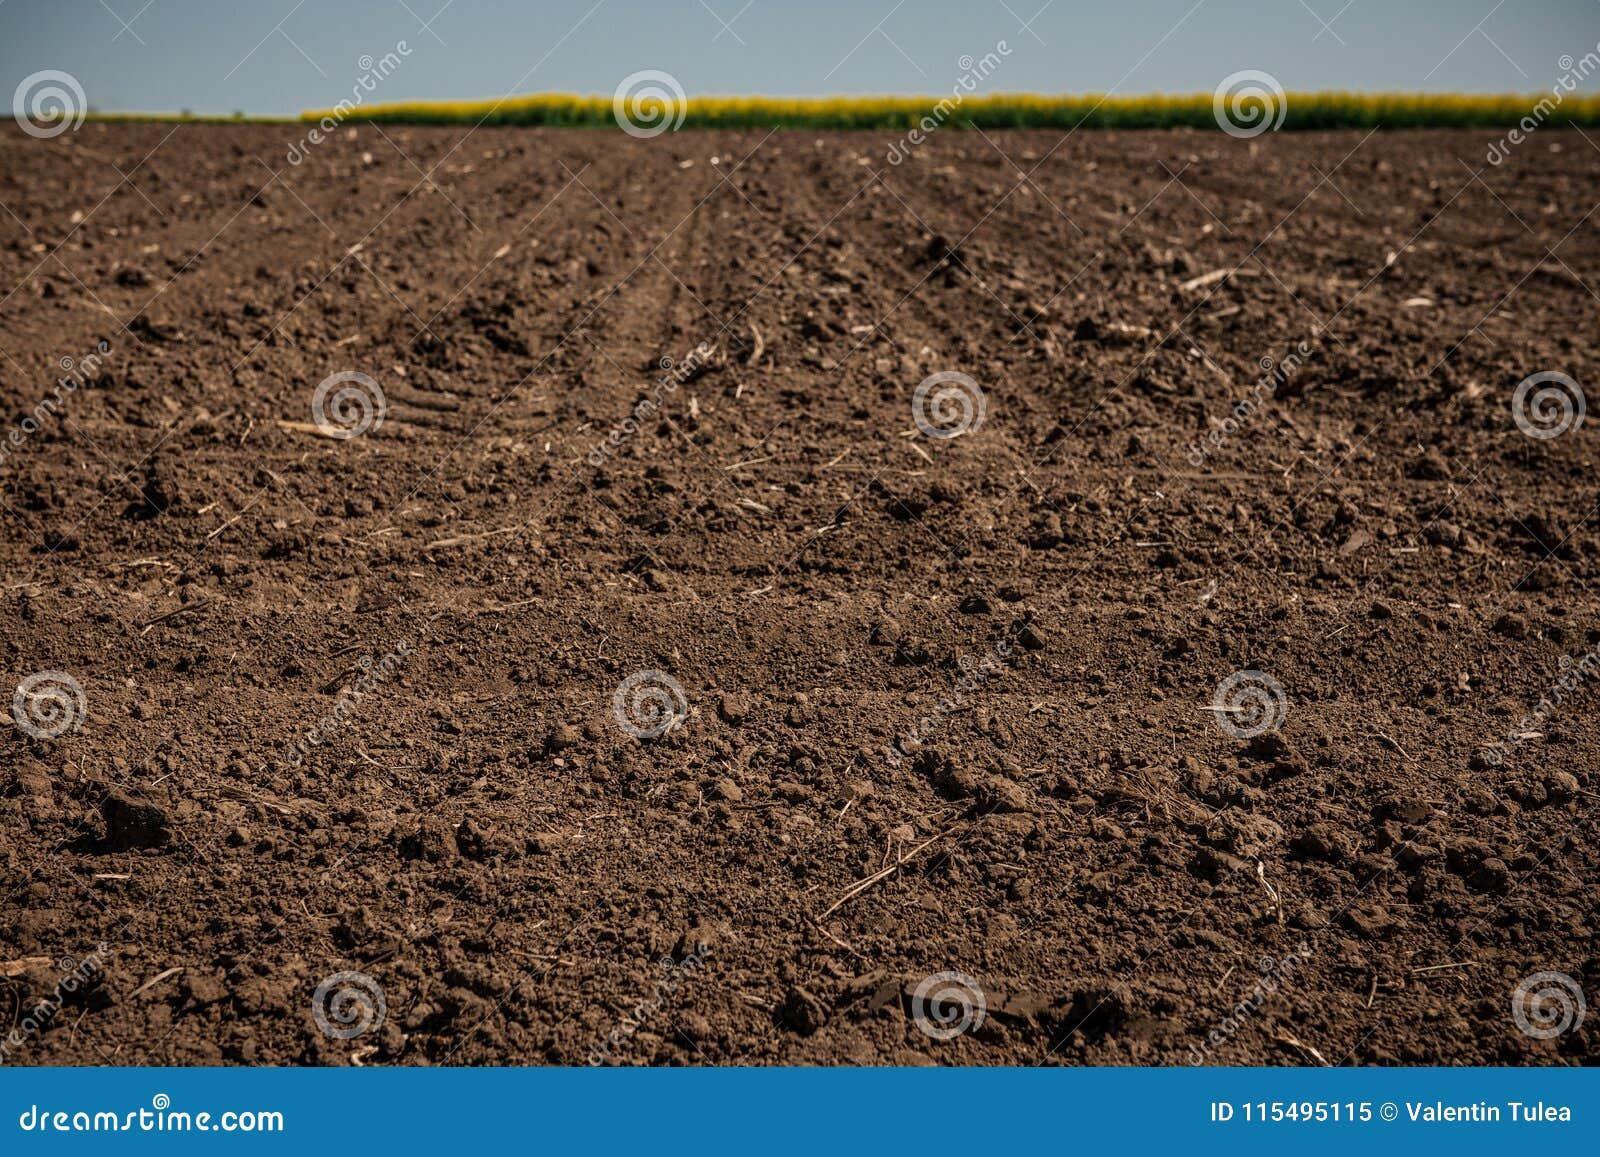 Unworked land, field. Dirt texture. Country dirt field texture.